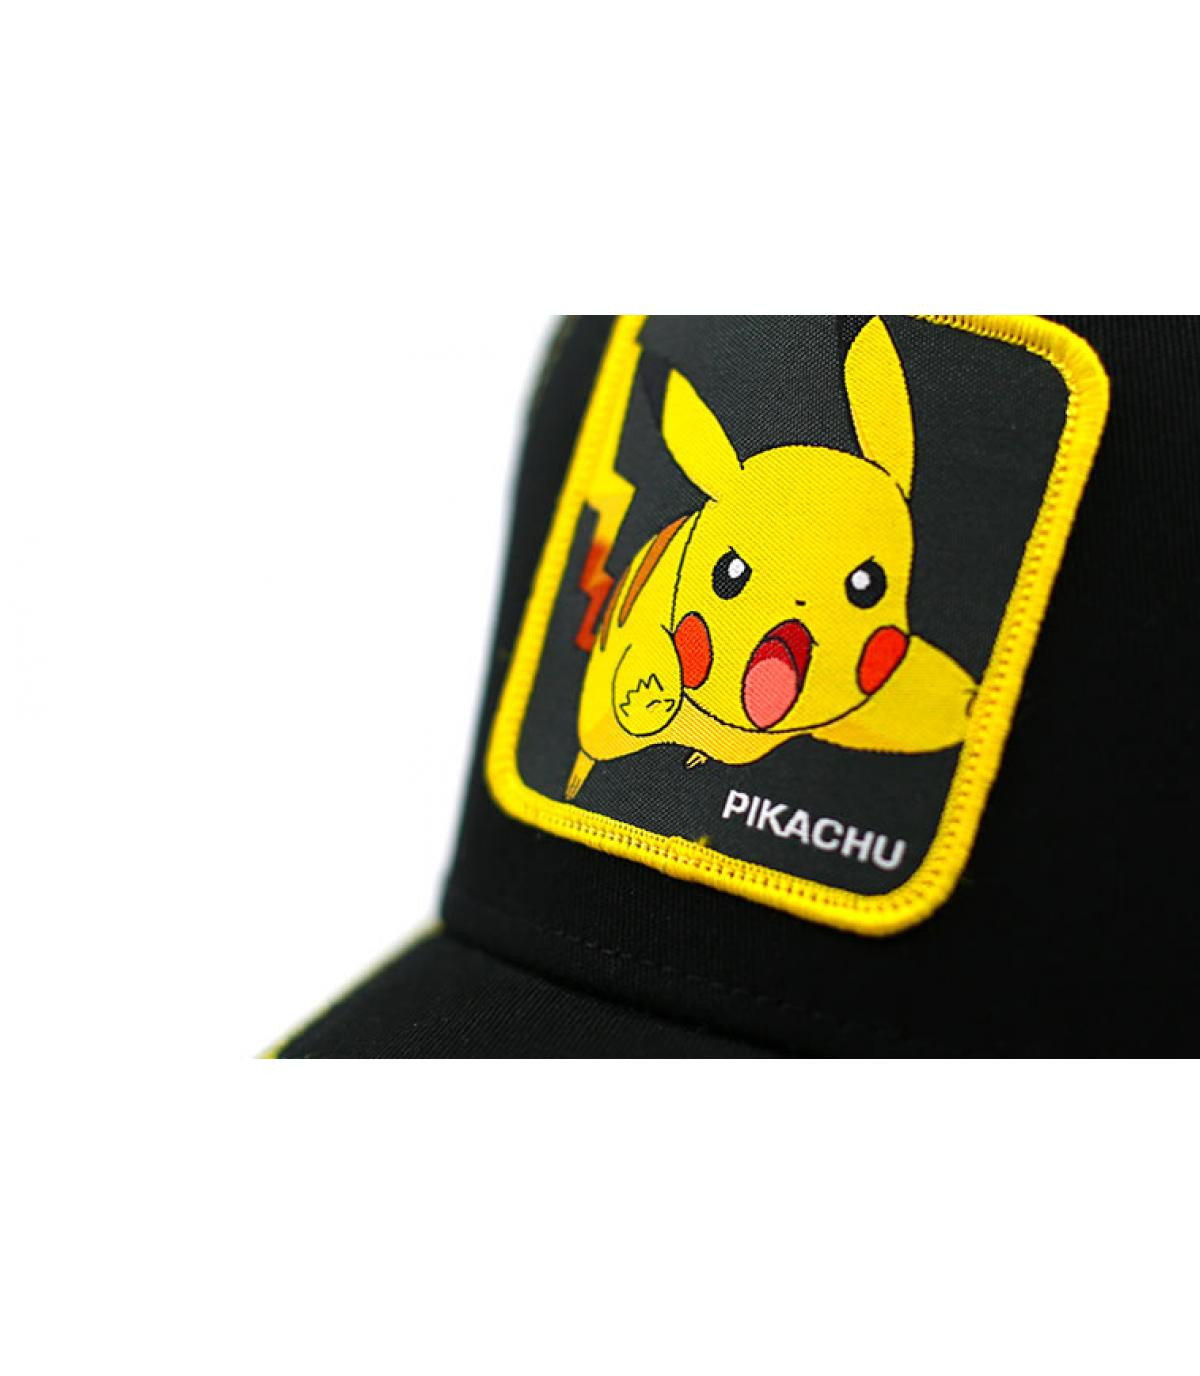 Details Trucker Pokemon Pikachu - Abbildung 3